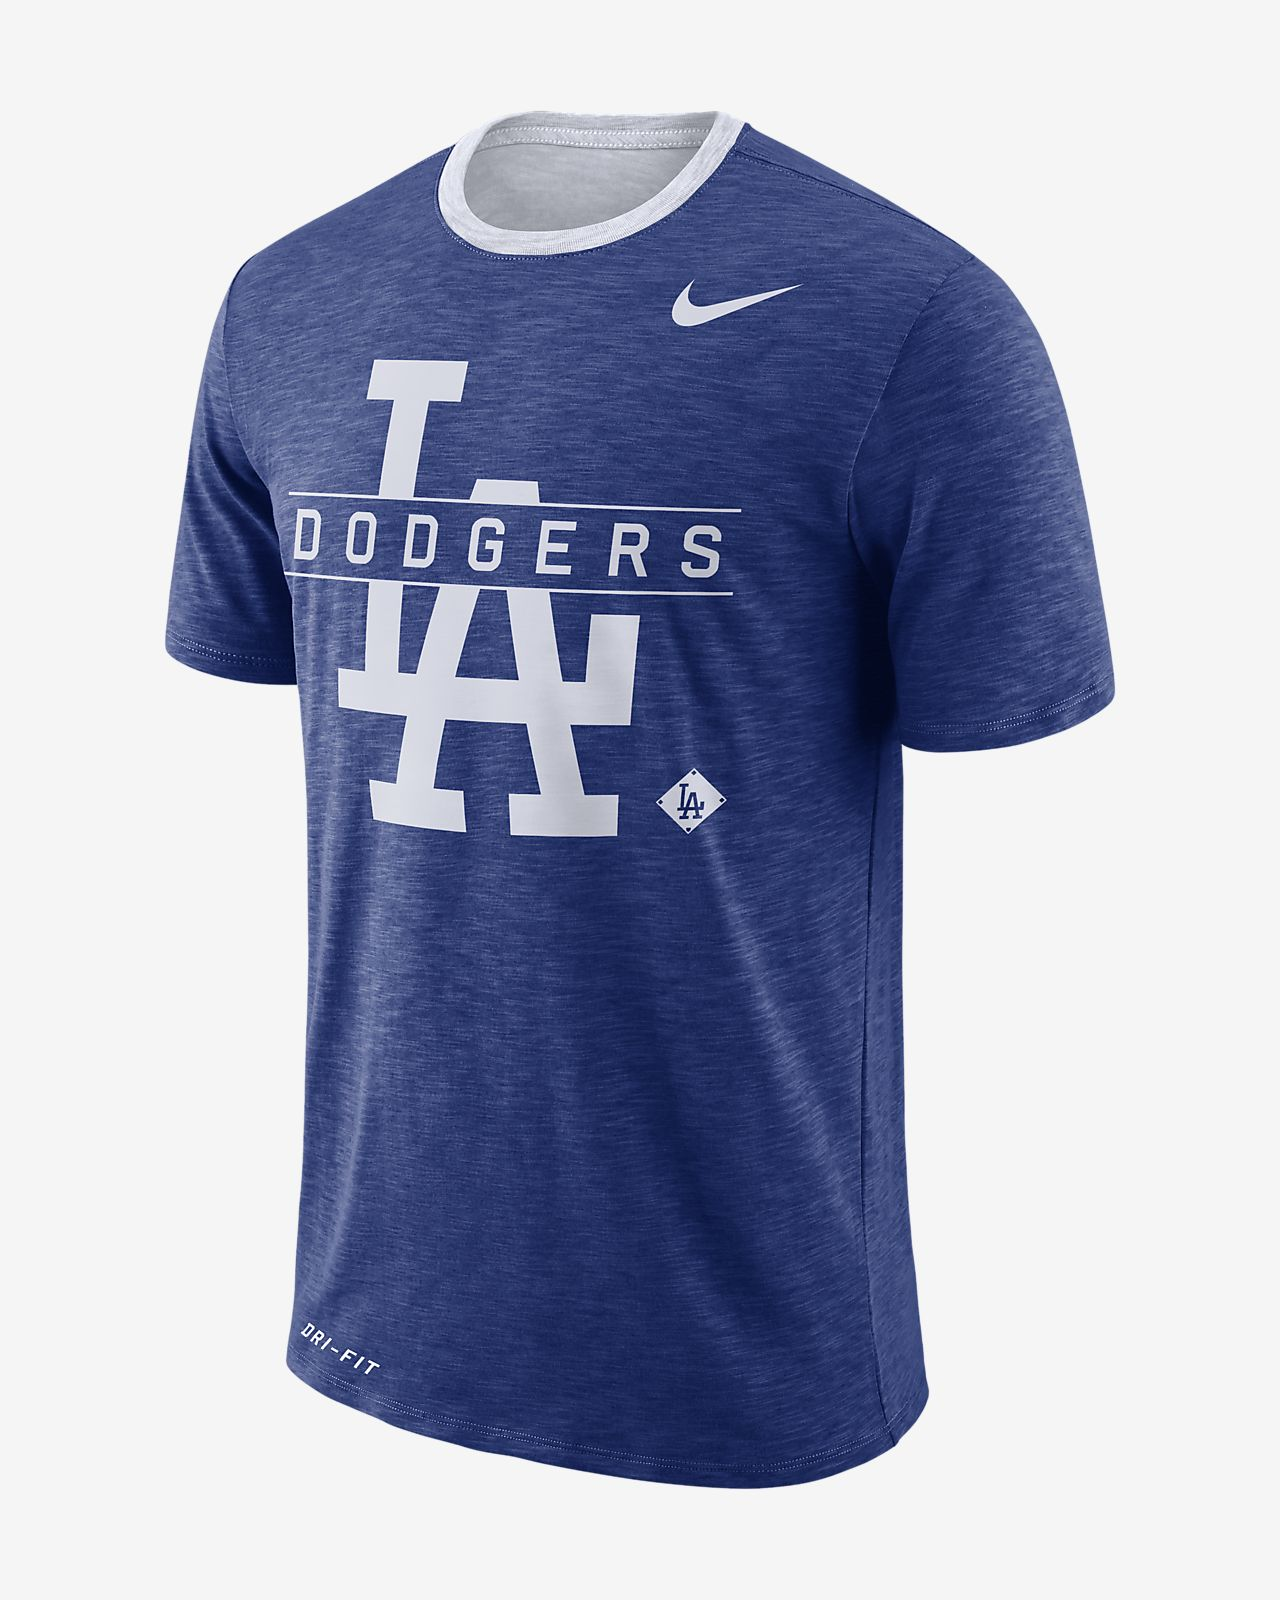 Nike Dri-FIT (MLB Dodgers) Men's T-Shirt